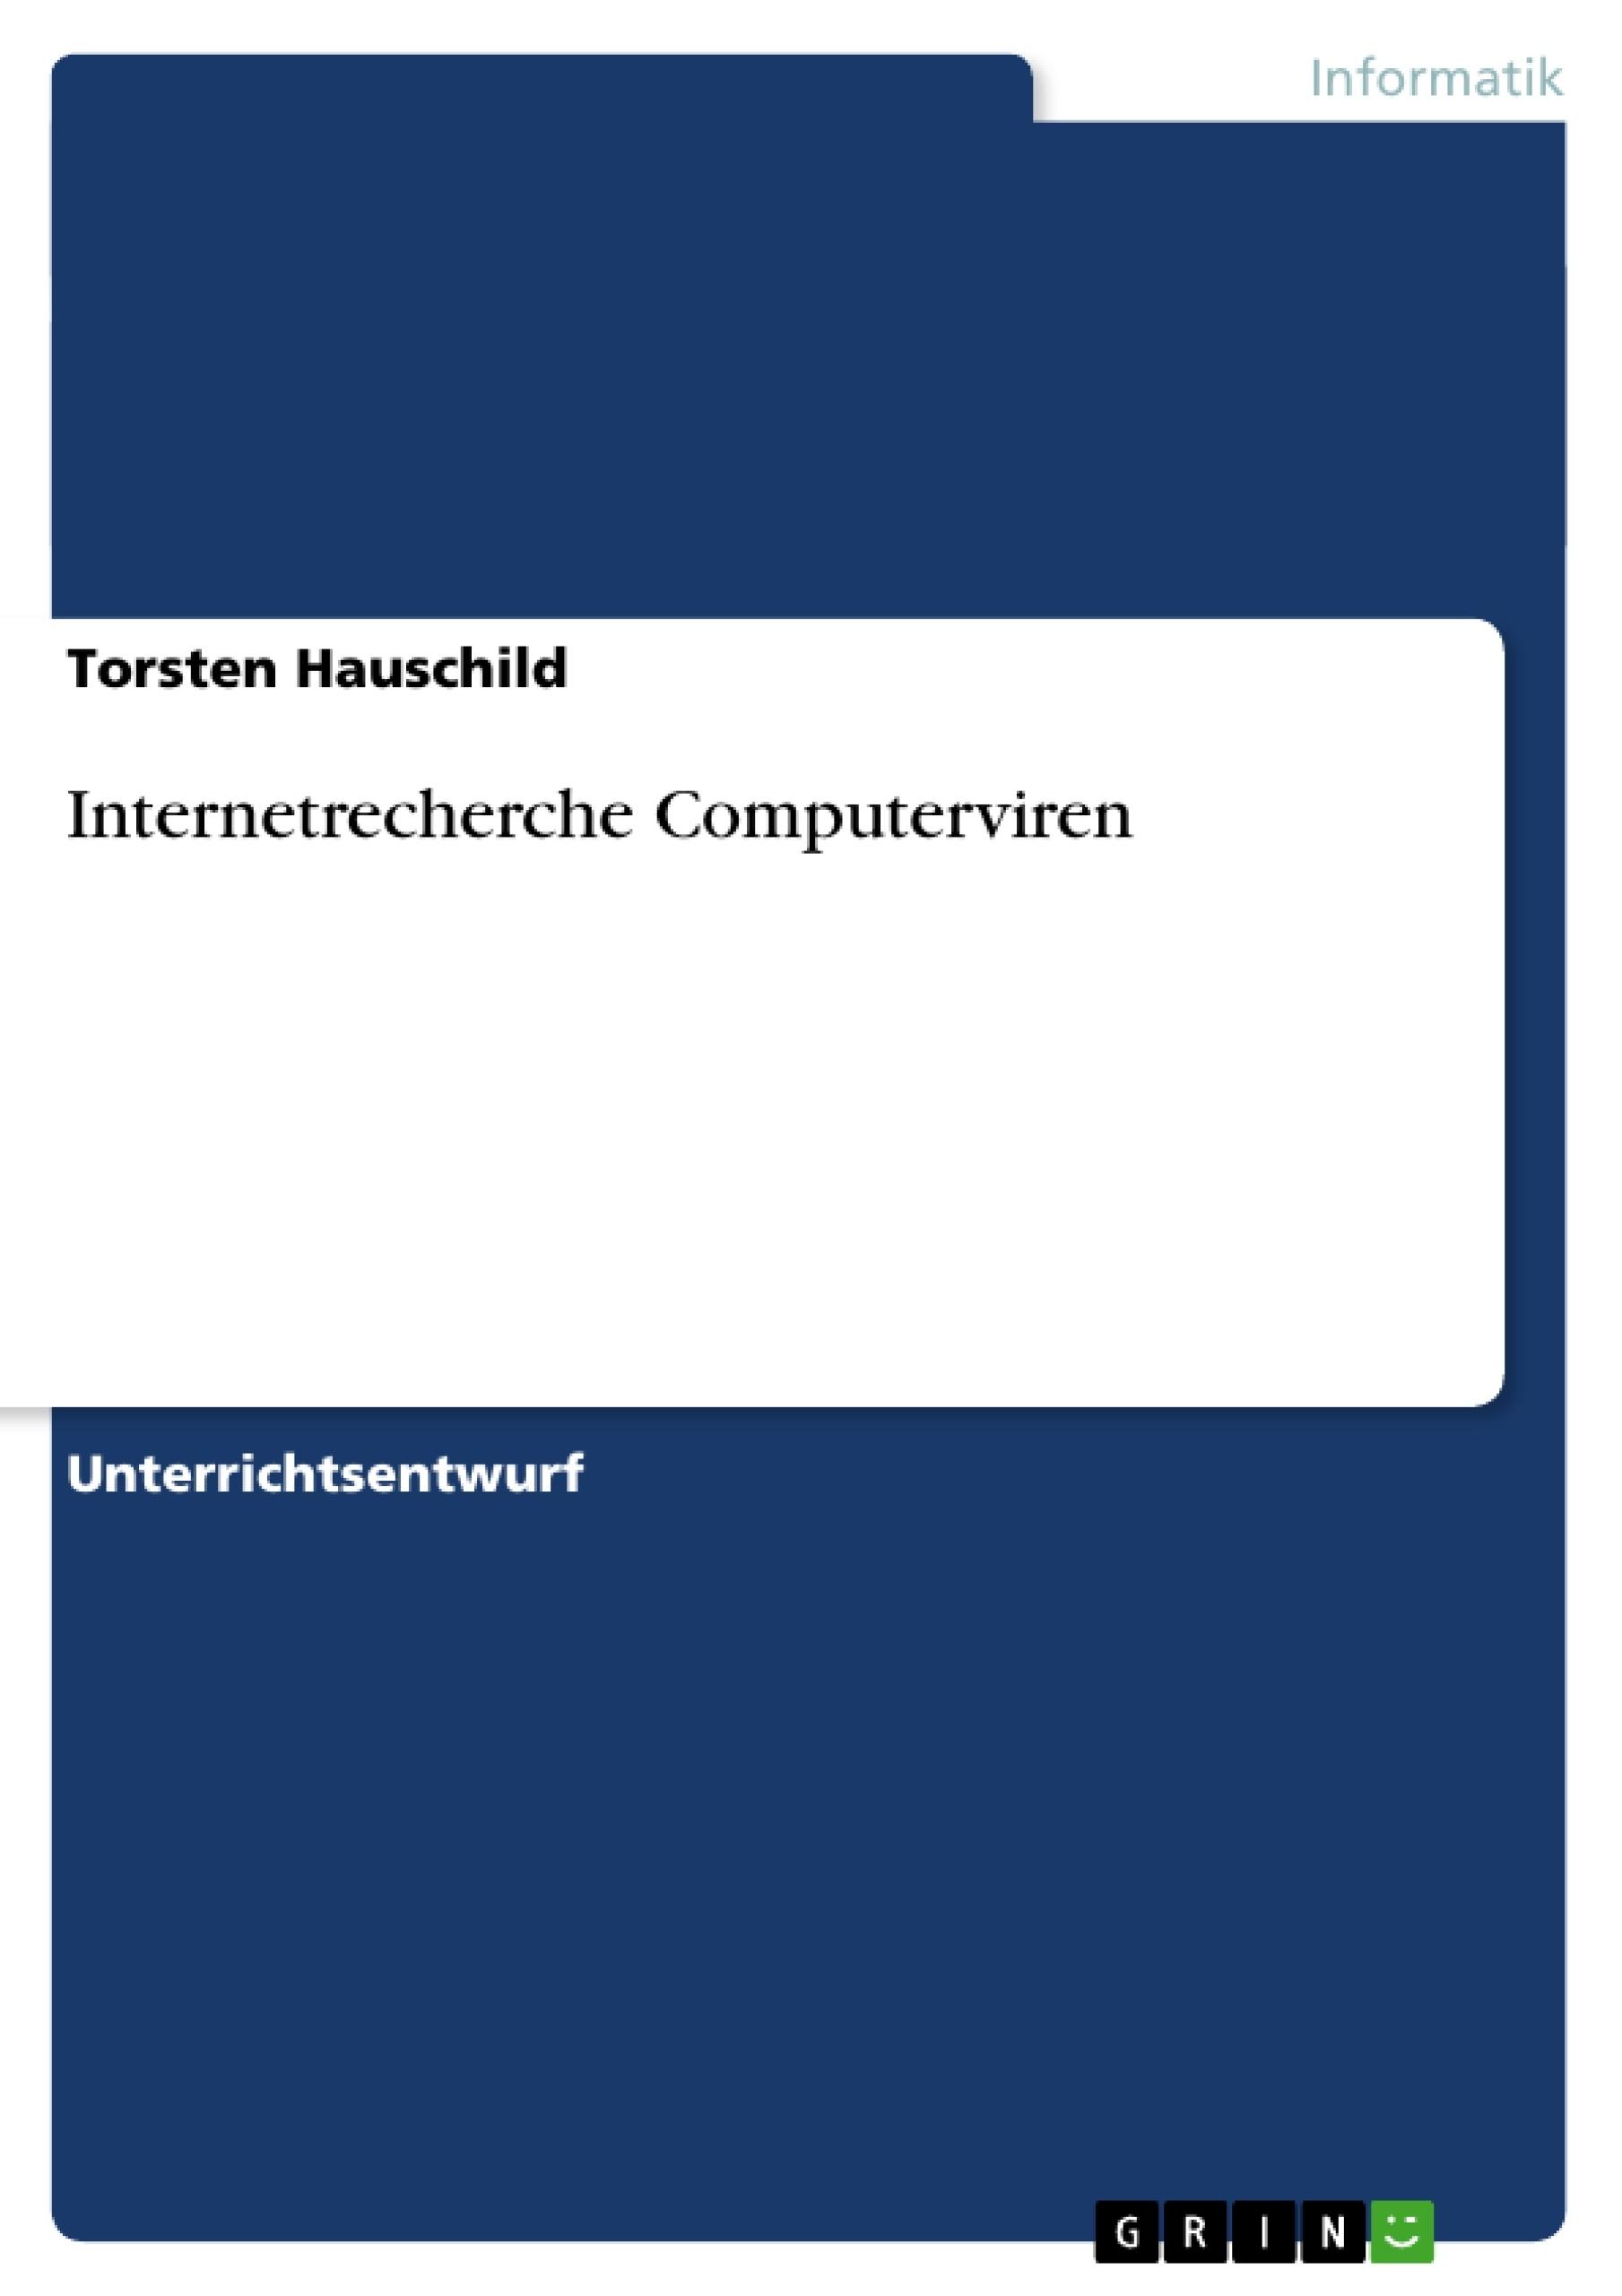 Titel: Internetrecherche Computerviren